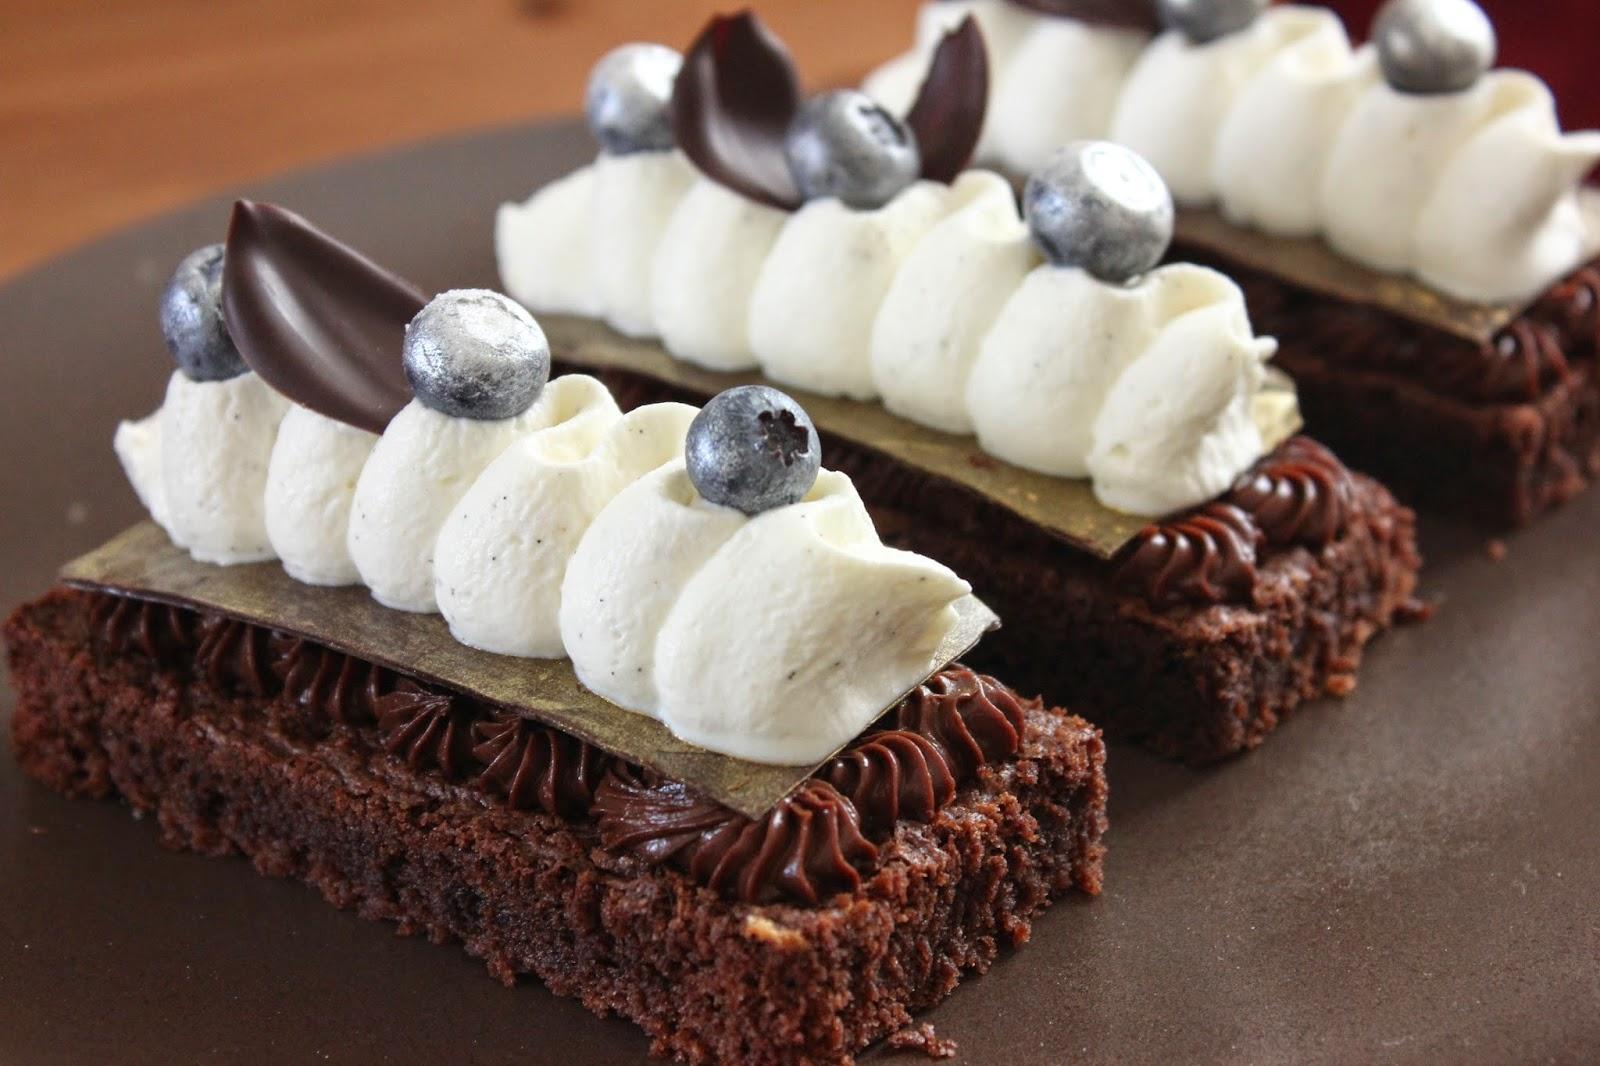 dessert l 39 assiette chocolat et vanille amour. Black Bedroom Furniture Sets. Home Design Ideas